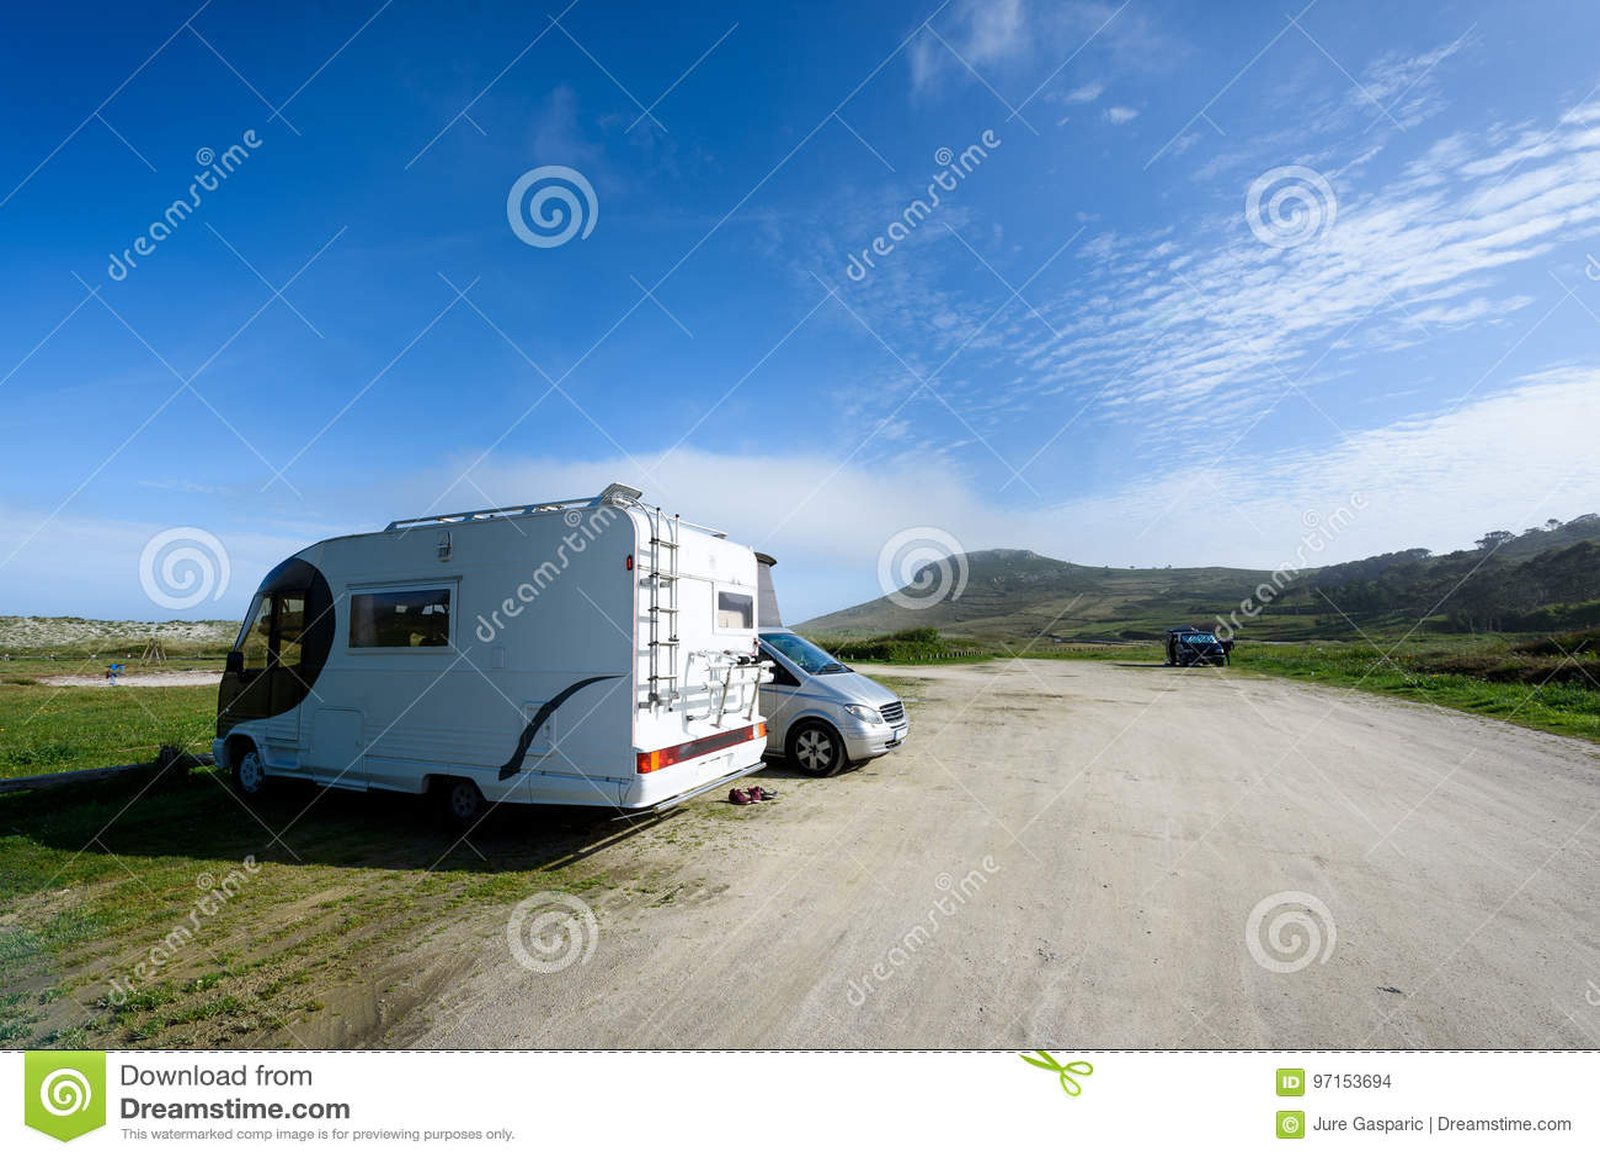 Motorhome RV и campervan припарковано на пляже